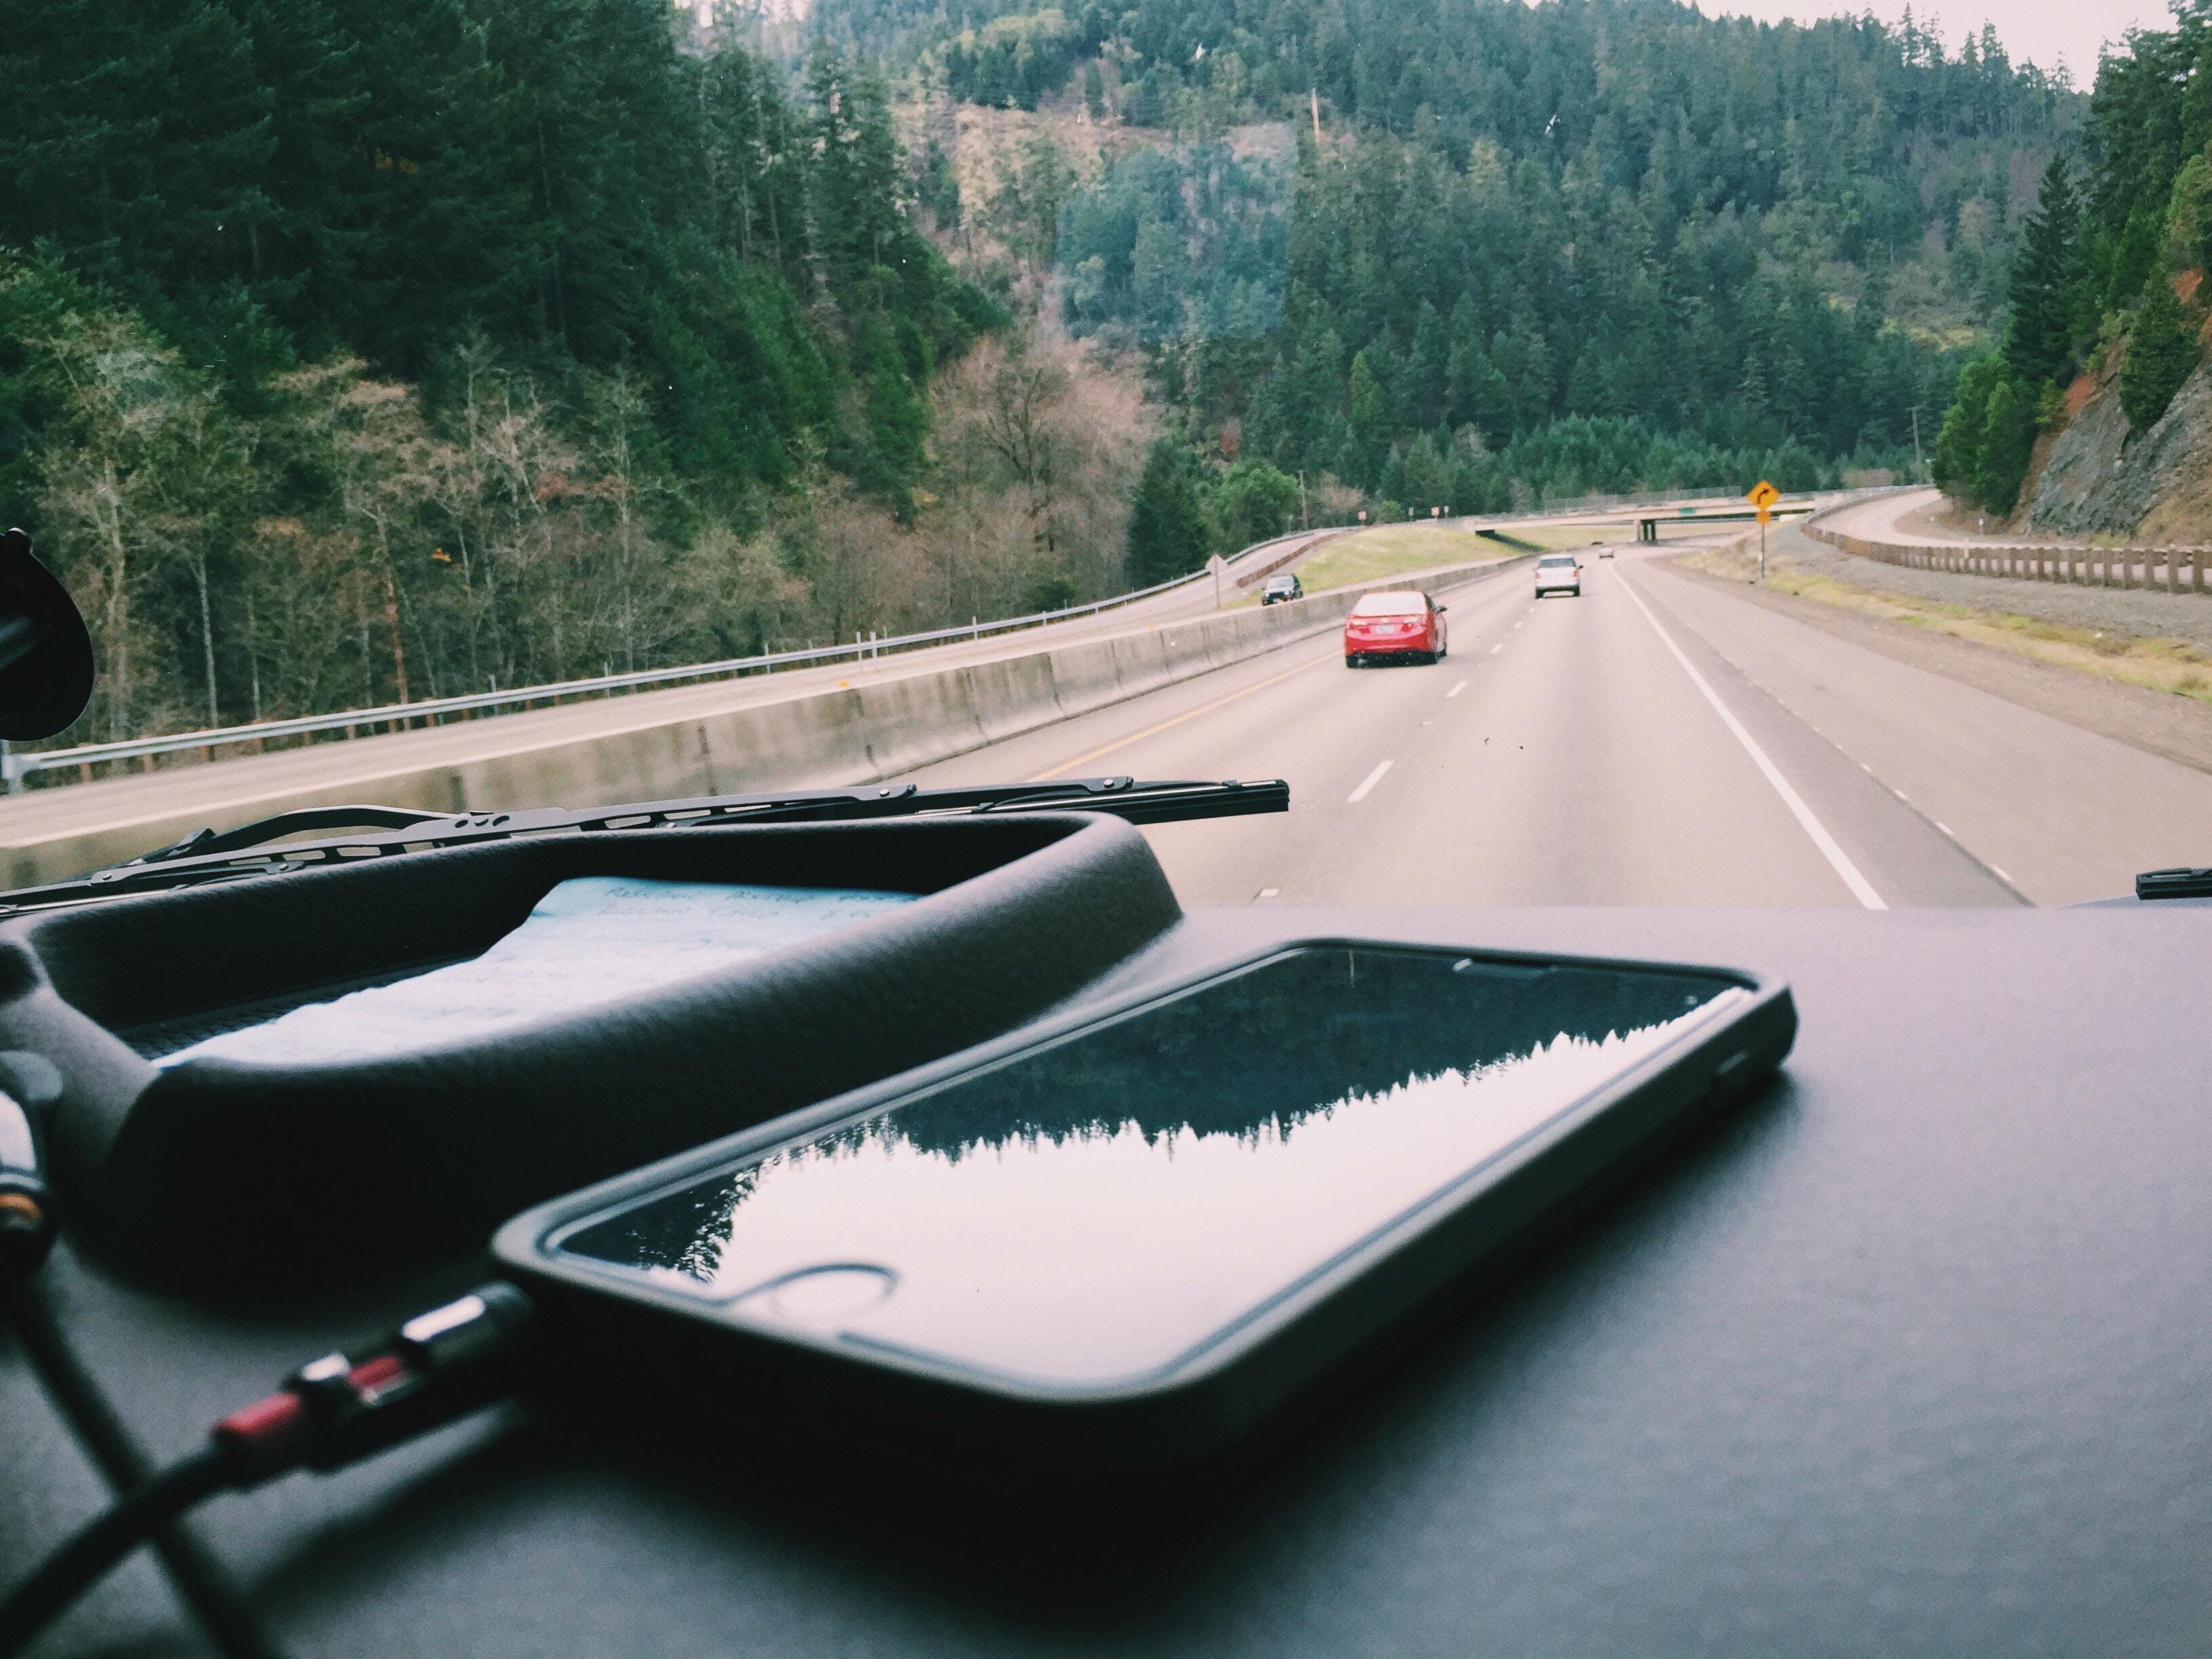 Iphone on Vehicle Dashboard